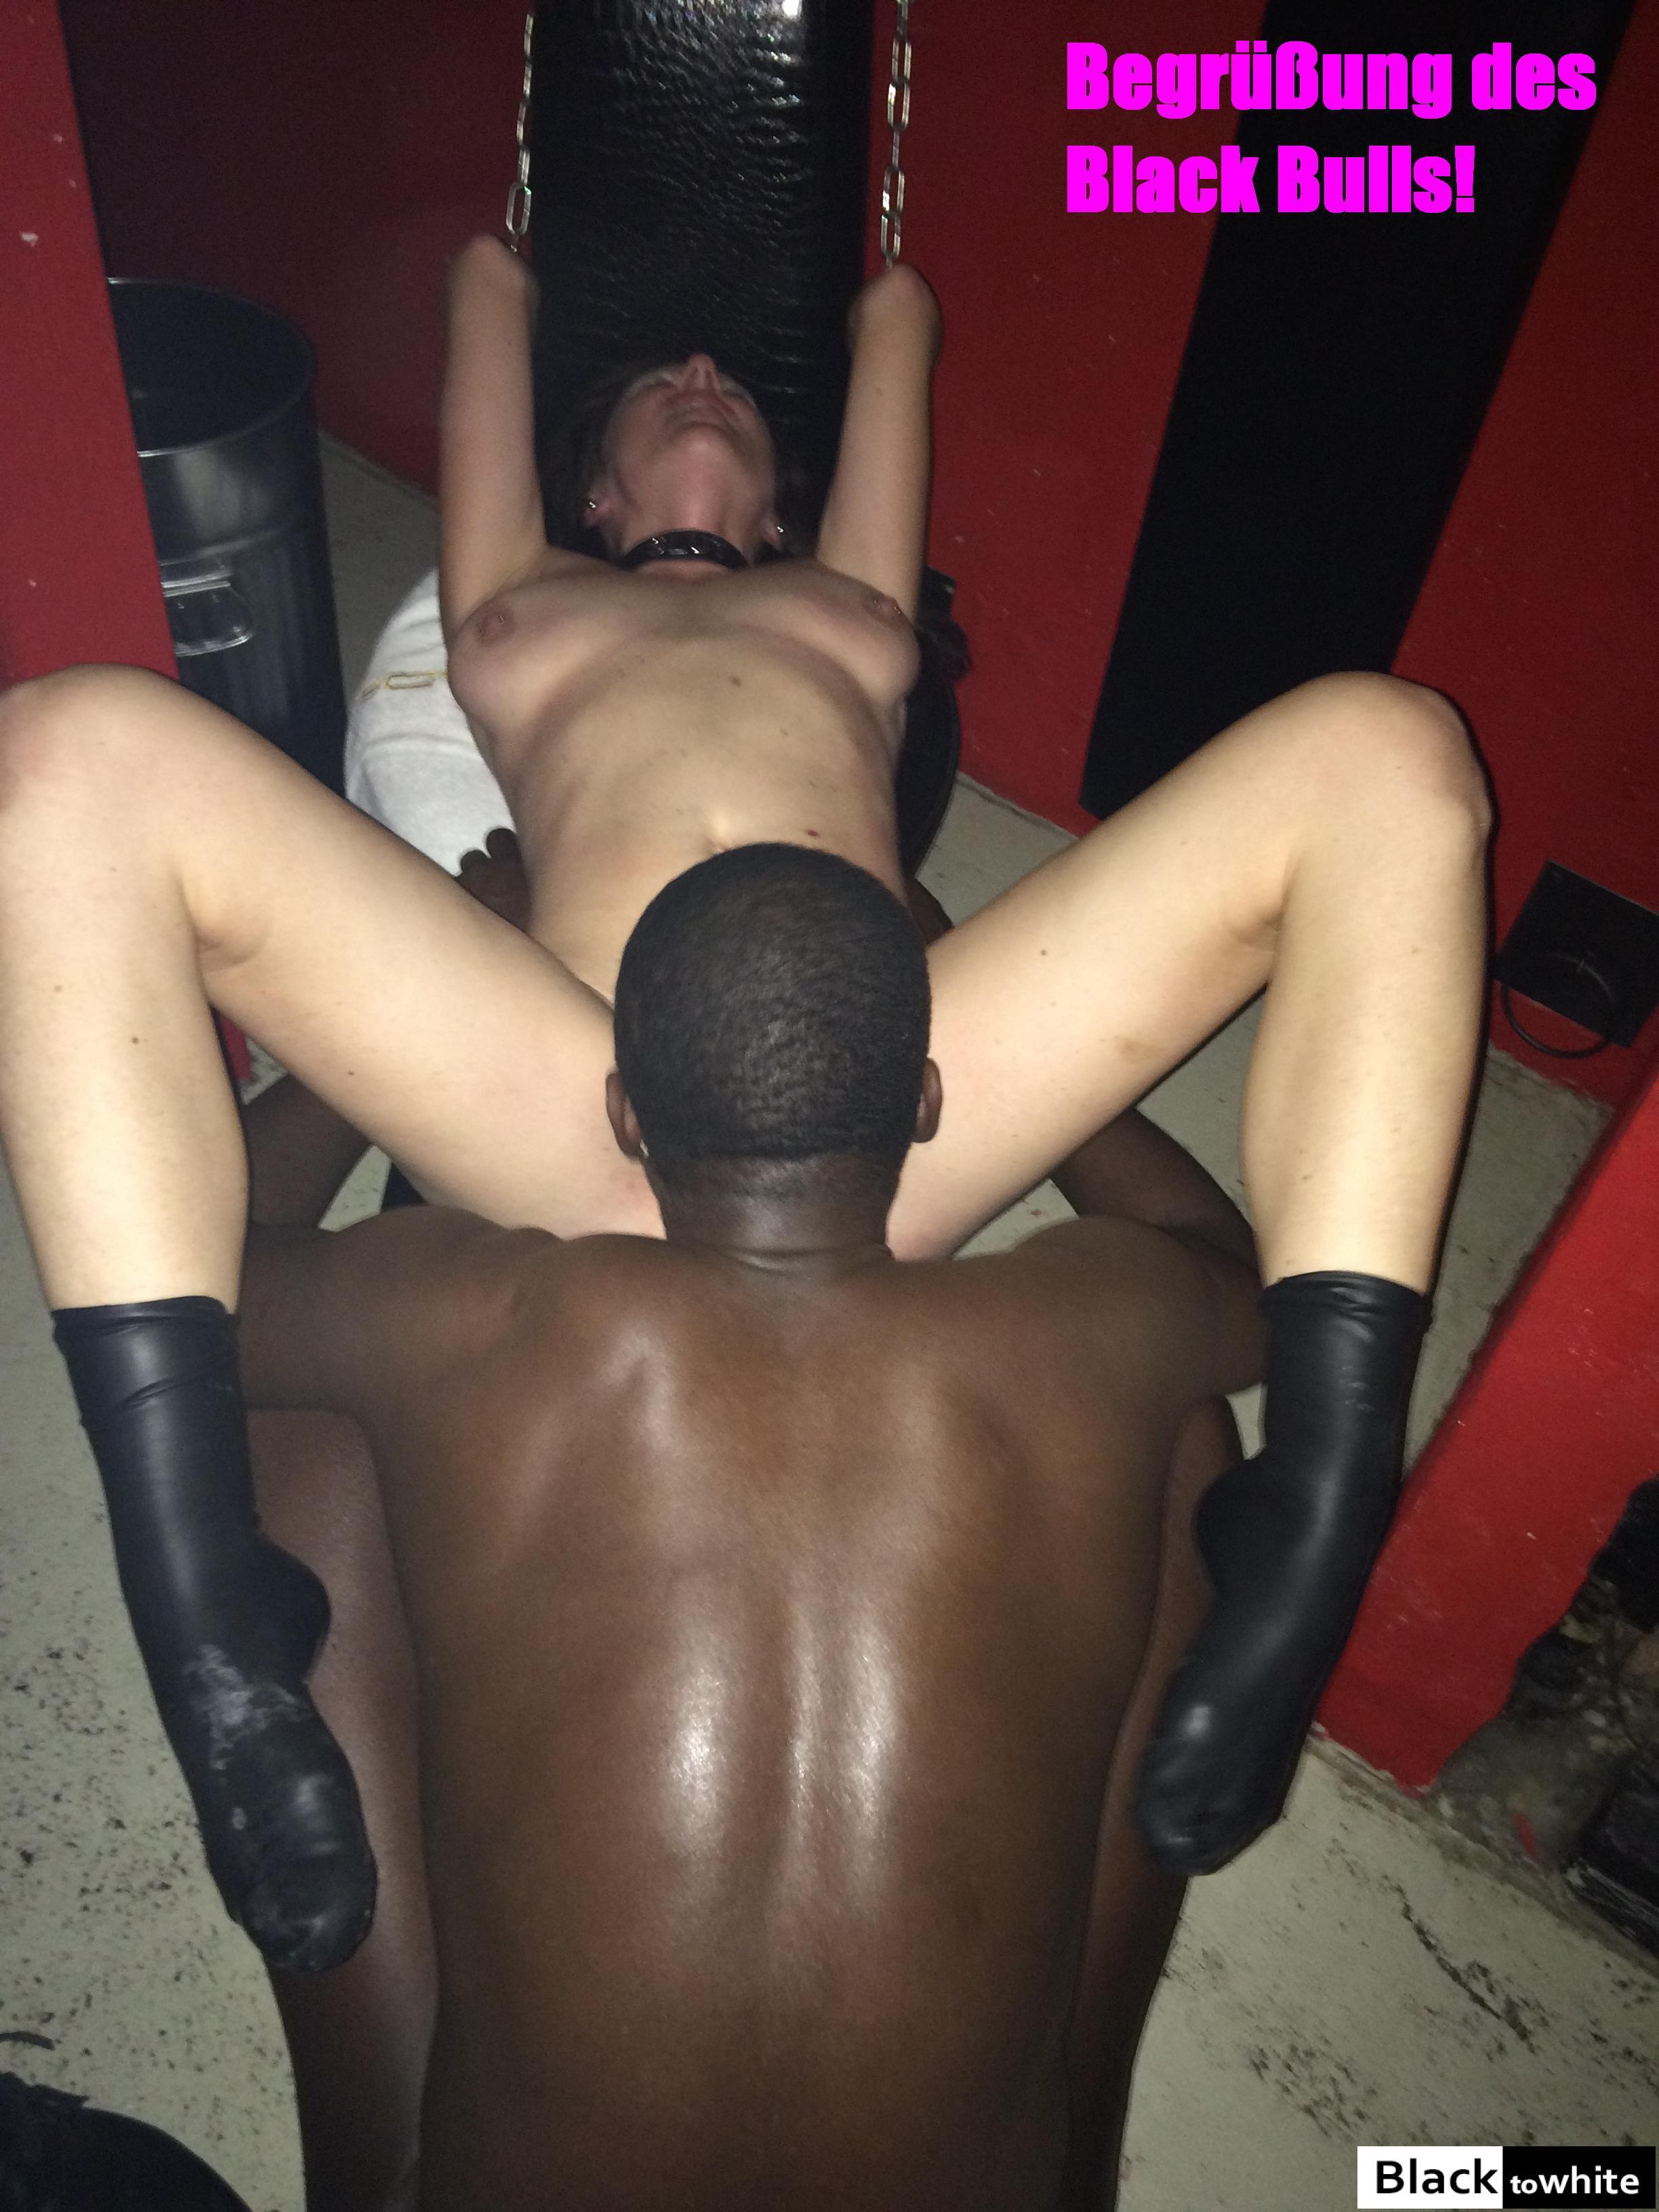 Amateur Hotwife black bull an hotwife amateur interracial community cuckold